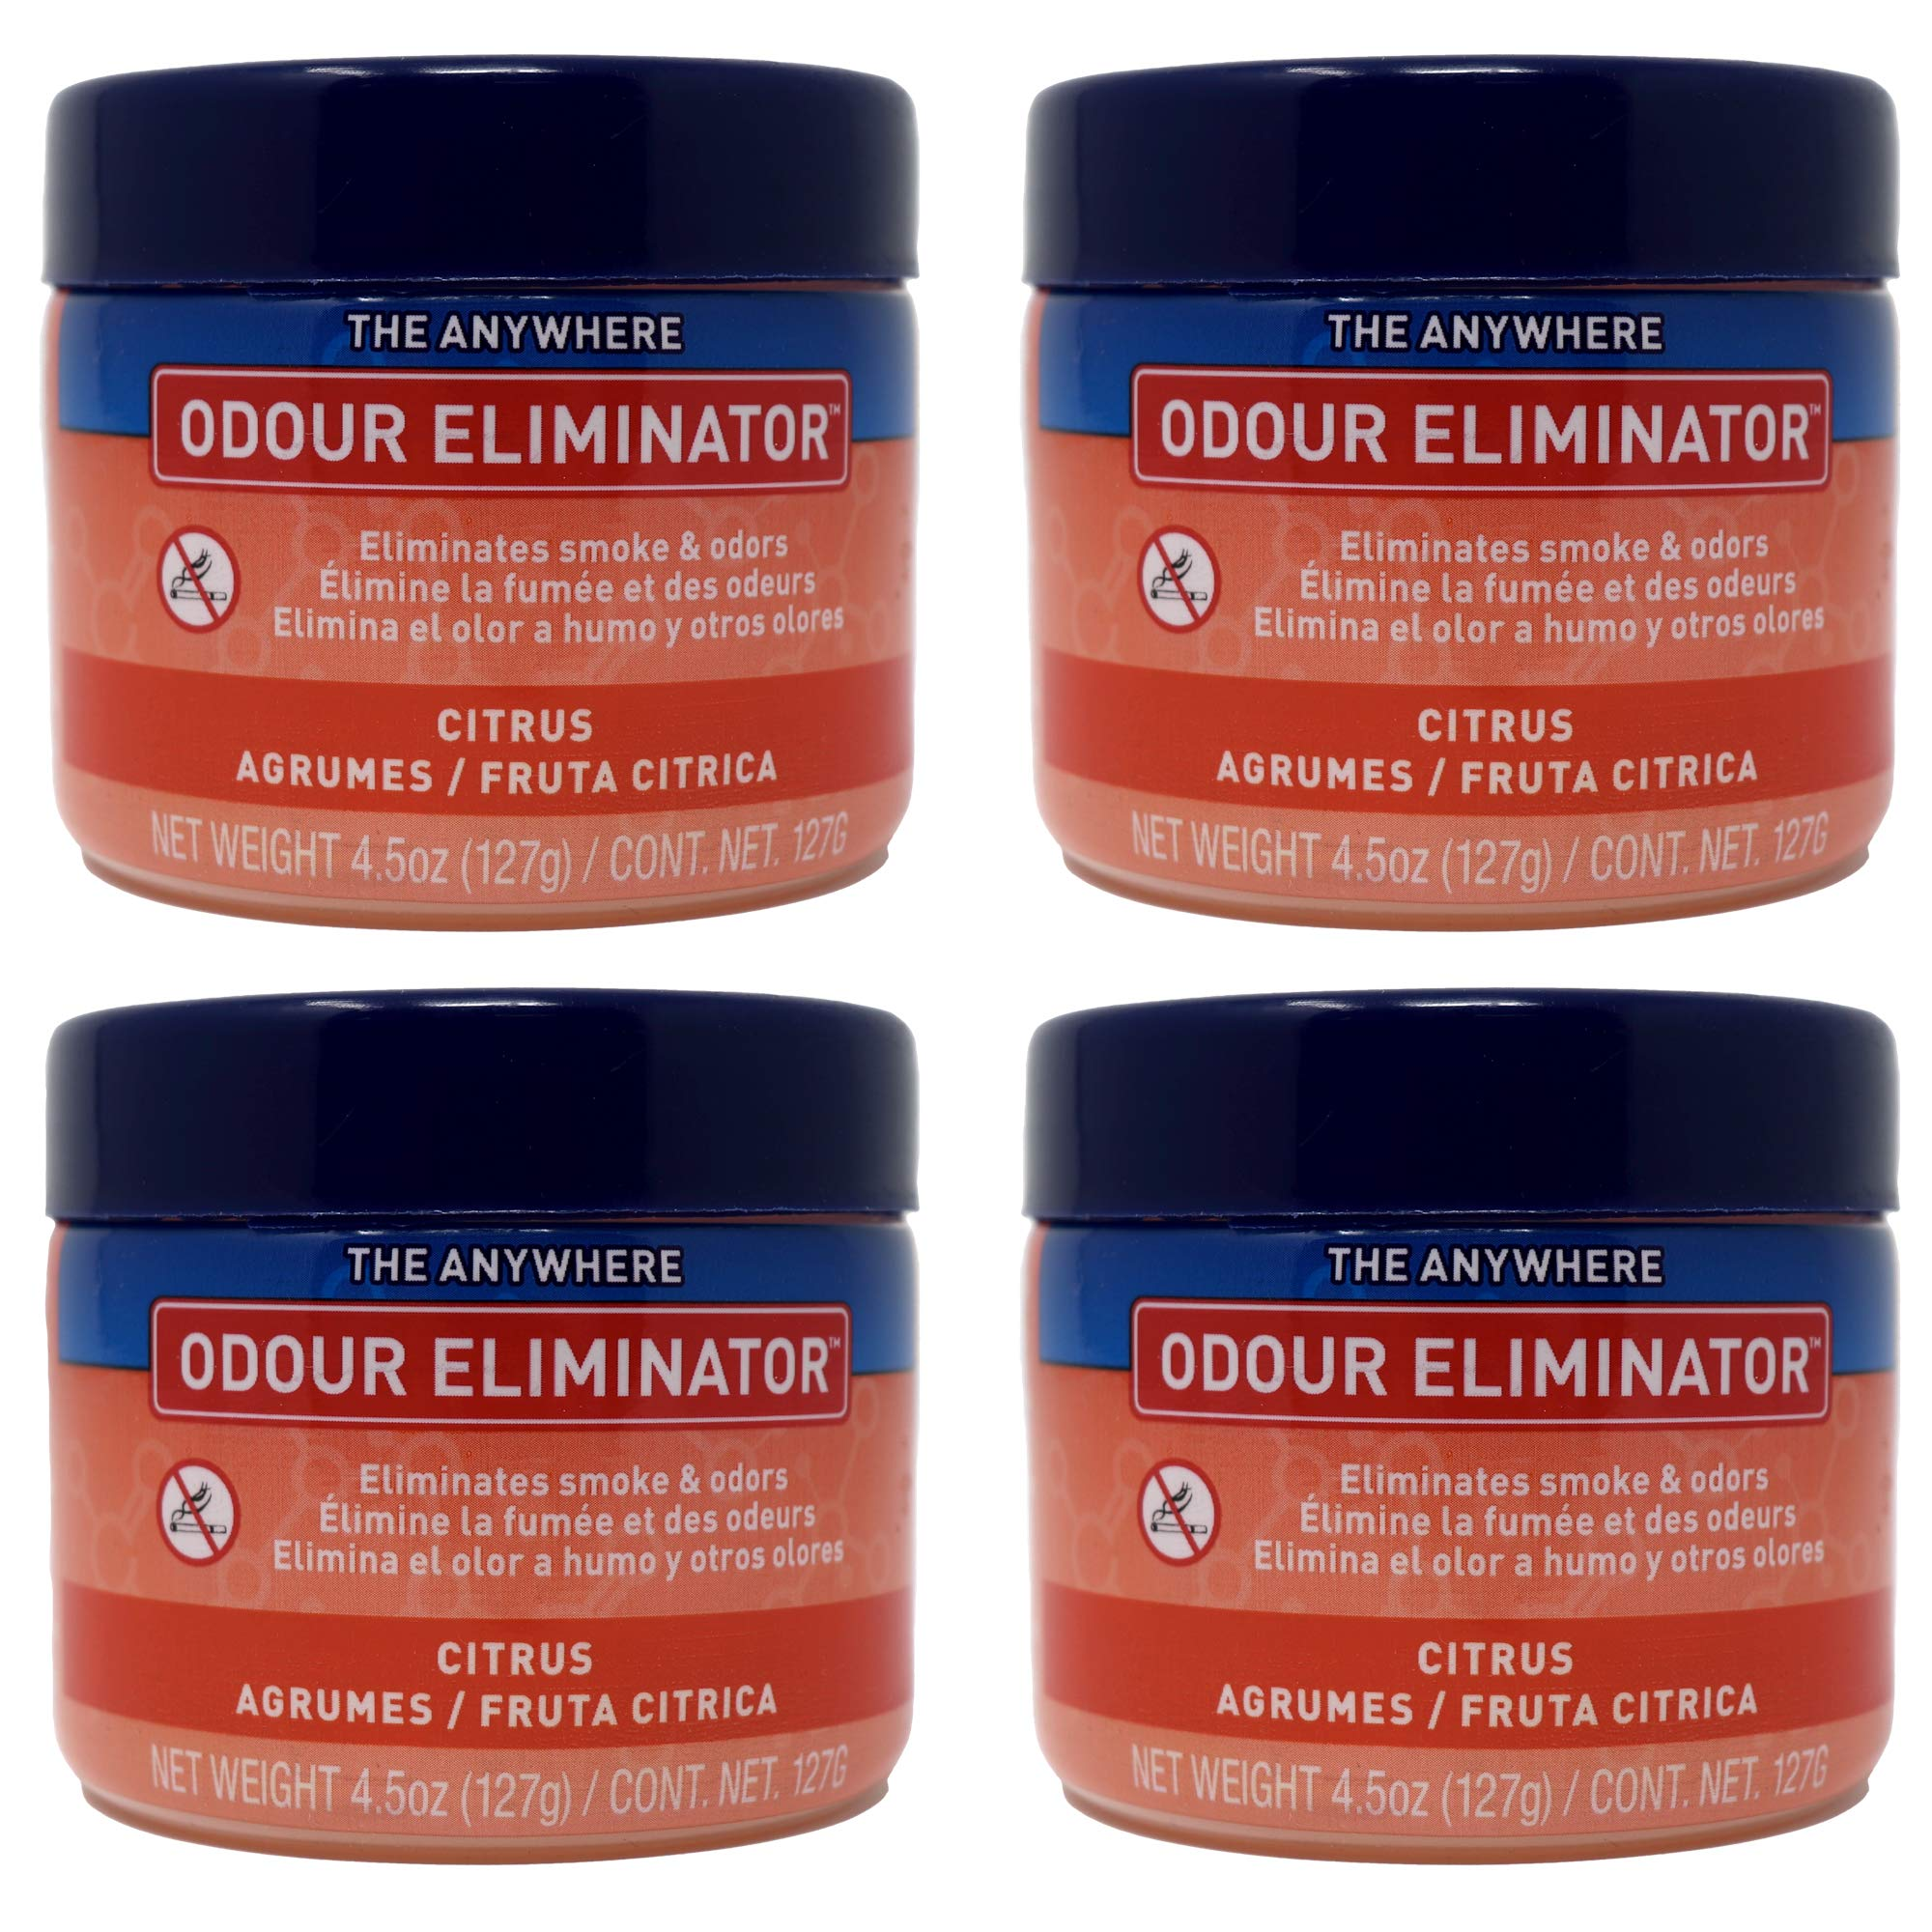 Ozium Gel Smoke & Odor Eliminator - The Original Anywhere Odor Eliminator & Deodorizer, Fresh Citrus Scent for Home, Office, RV and Car Air Freshener 4.5 oz Gel (Pack of 4) by Ozium